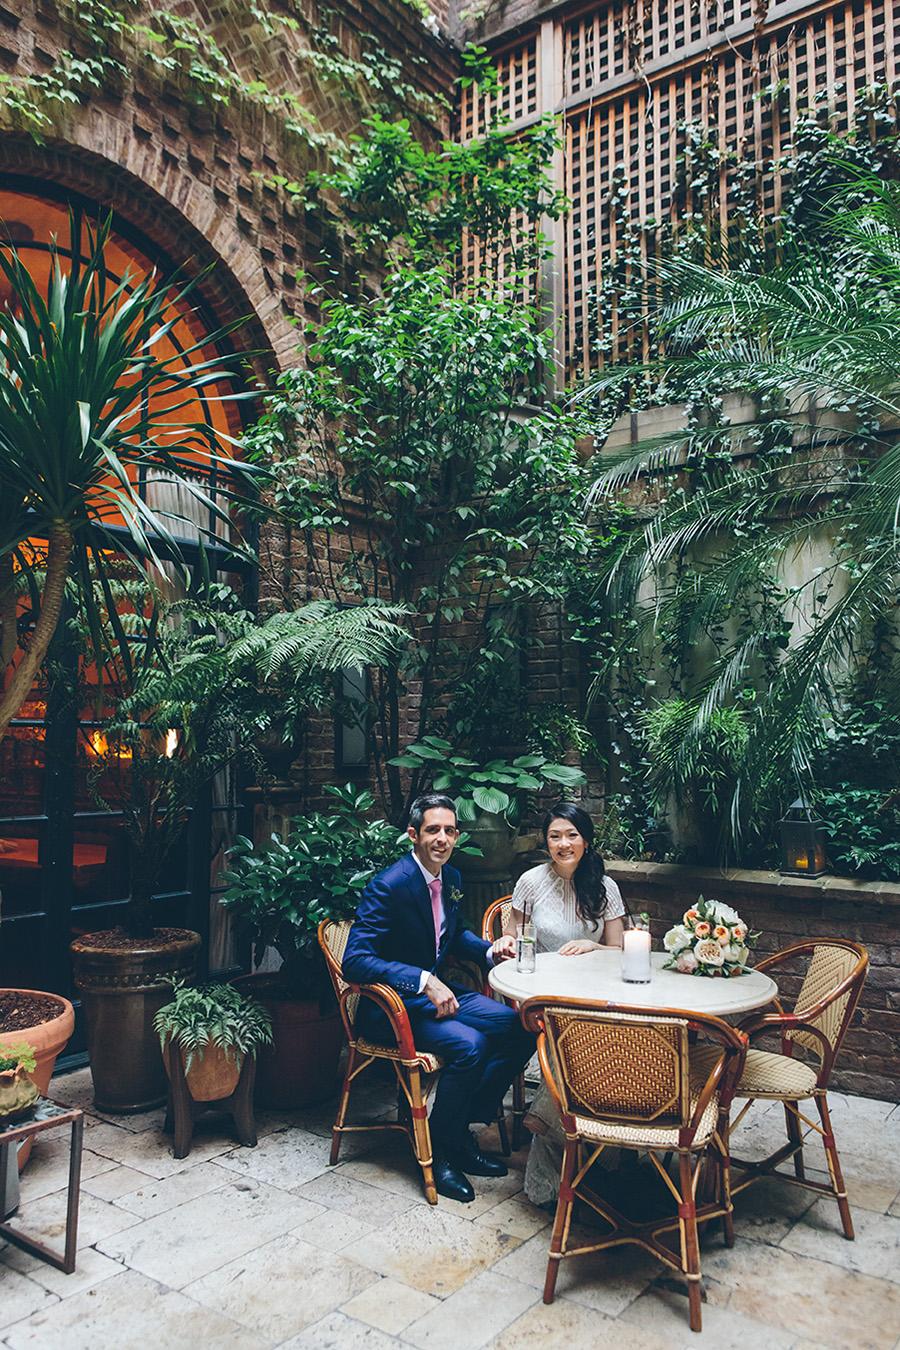 NEW-YORK-CITY-WEDDING-PHOTOGRAPHER-WEST-VILLAGE-GREENWICH-HOTEL-GRAND-BANKS-PIER-0031.jpg